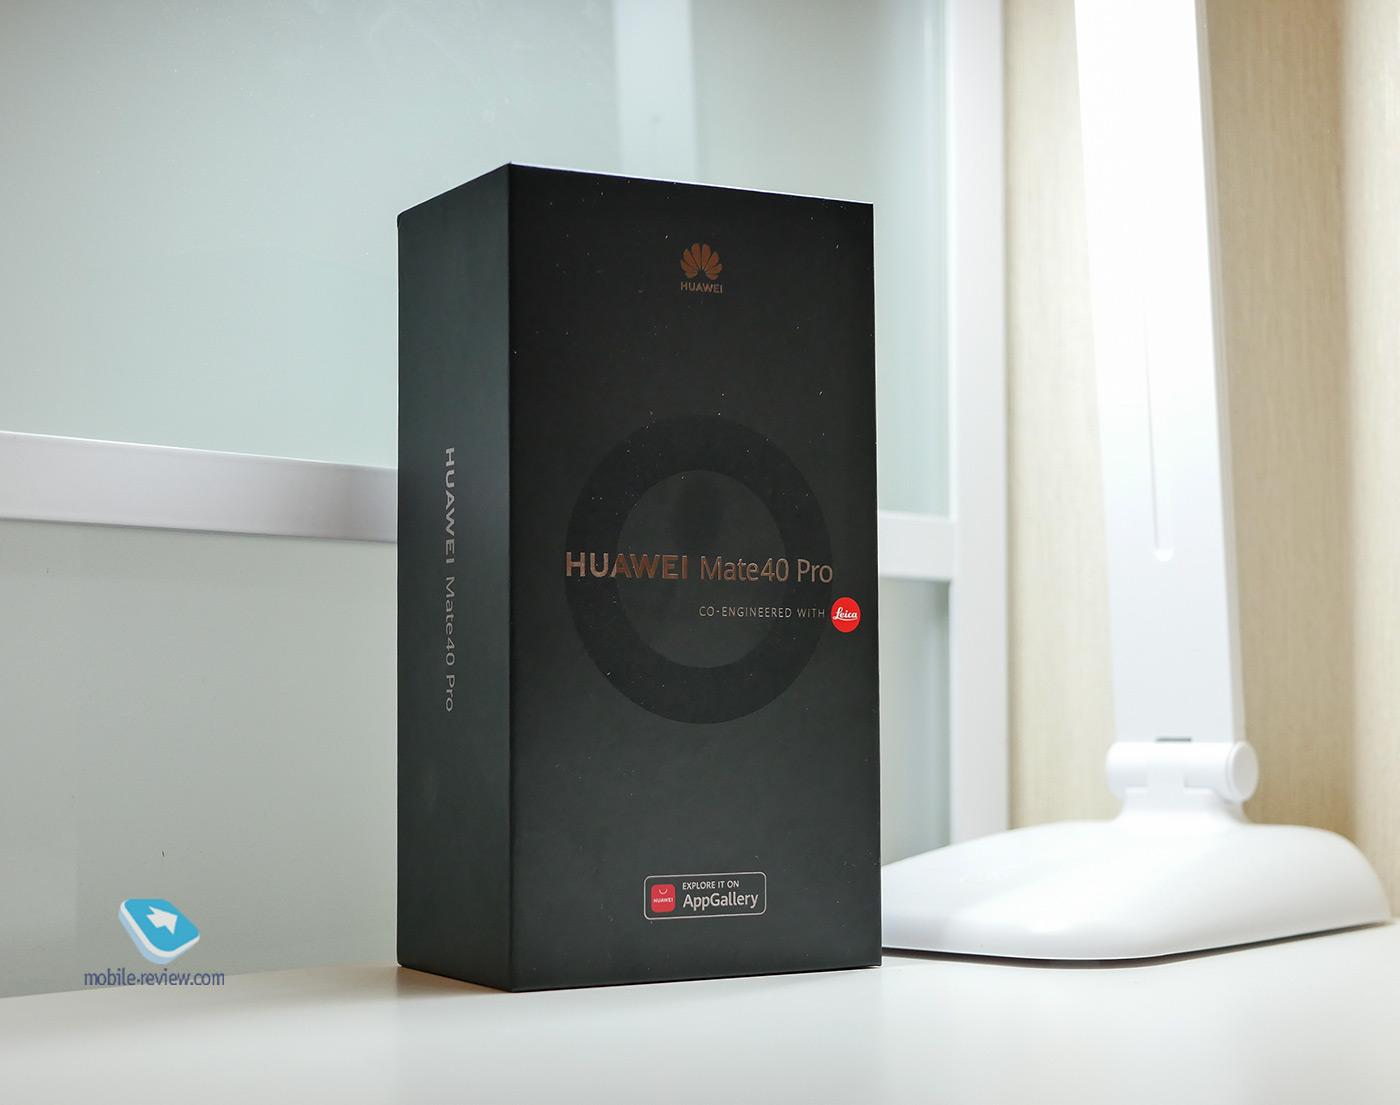 Быстрый обзор Huawei Mate 40 Pro